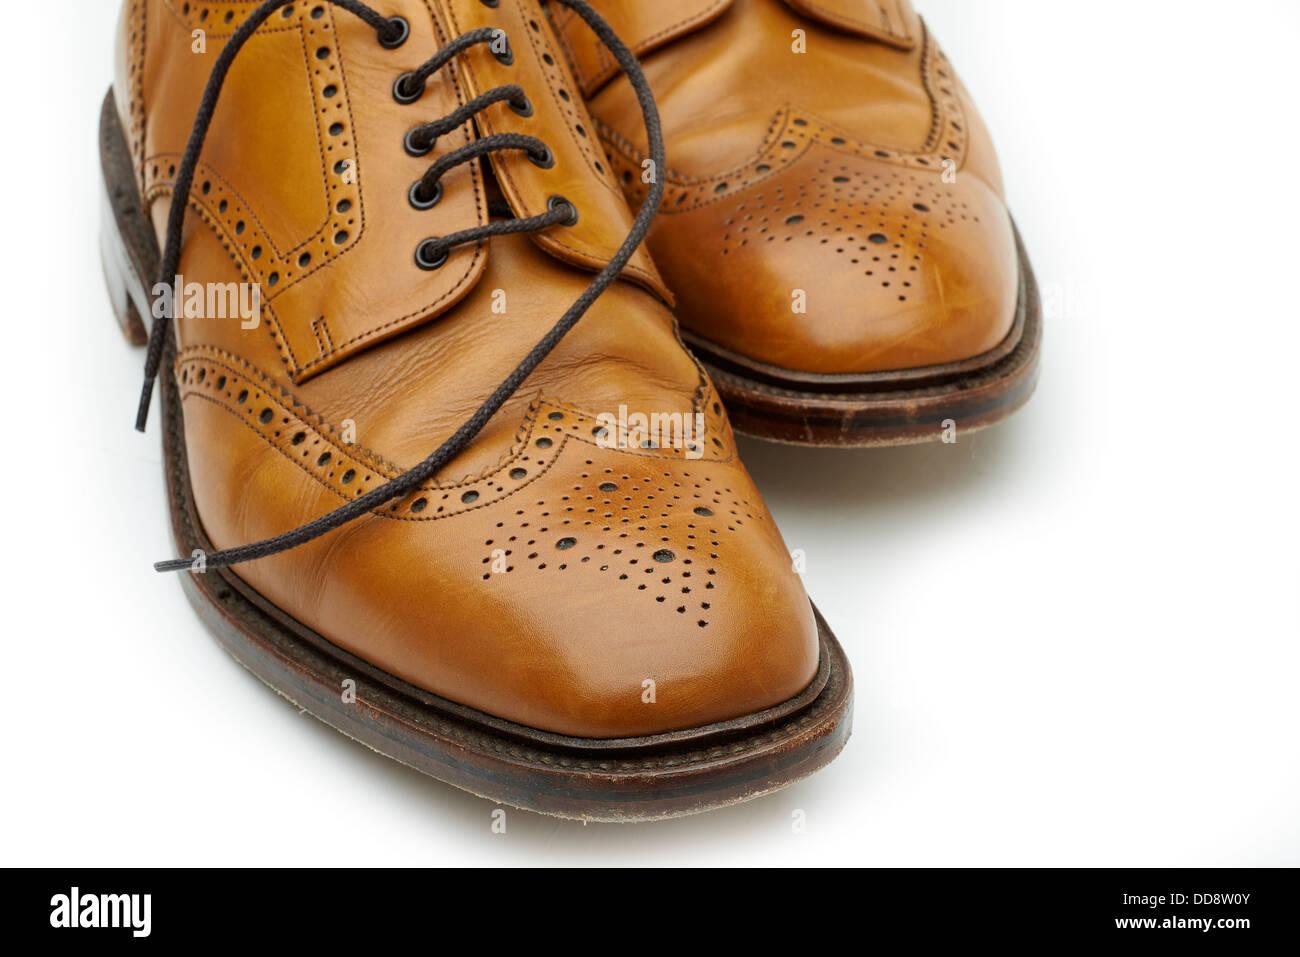 Loake shoes Brogues tan Classic english